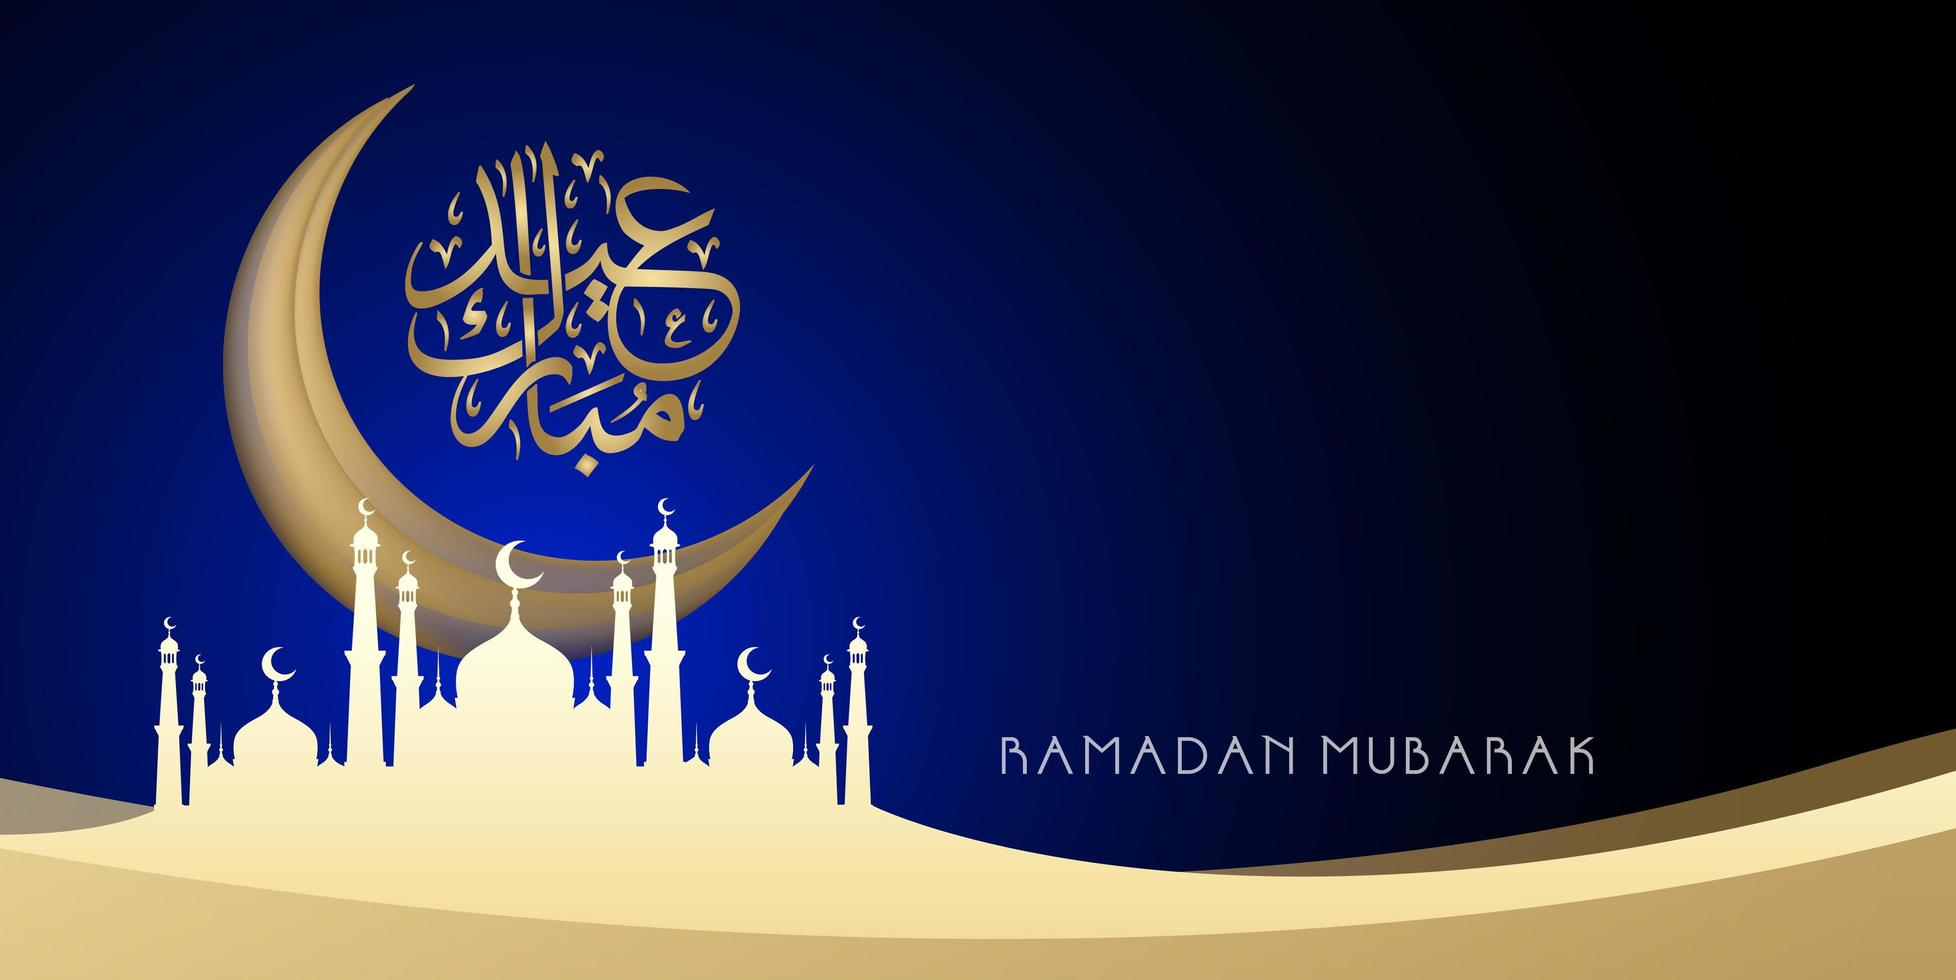 Ramadan Kareem dunkelblau mit gutem Mond Hintergrund vektor